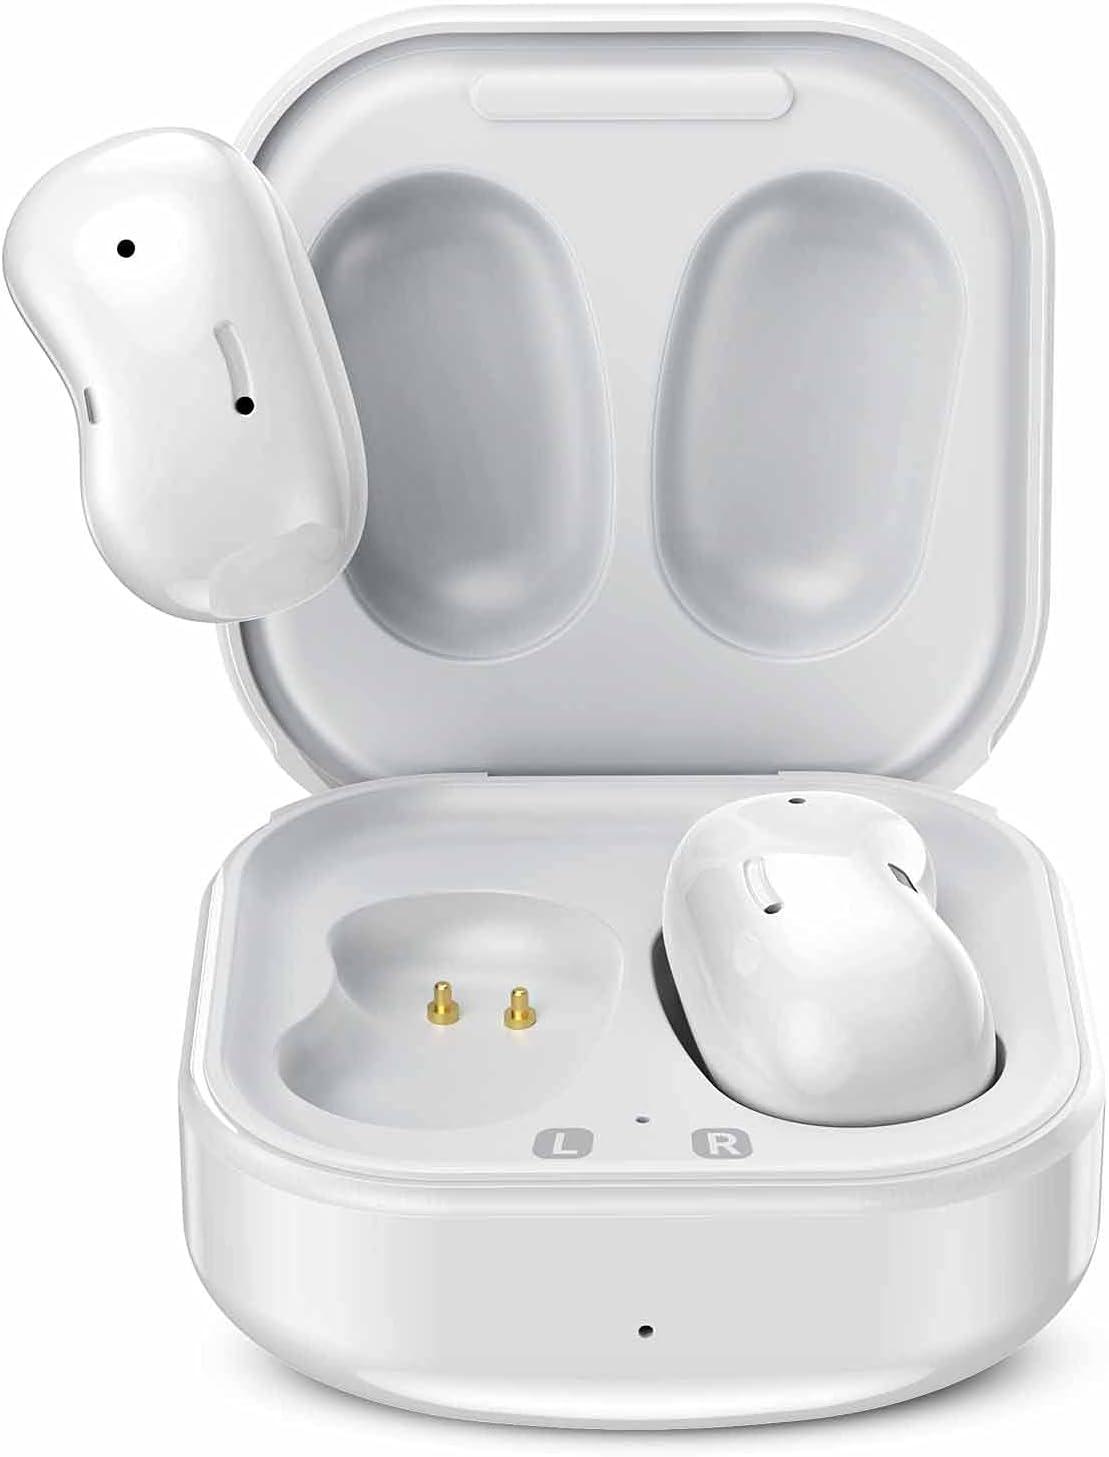 Urbanx Street Buds Live True favorite Headphones Earbud Wireless Discount is also underway for Leno